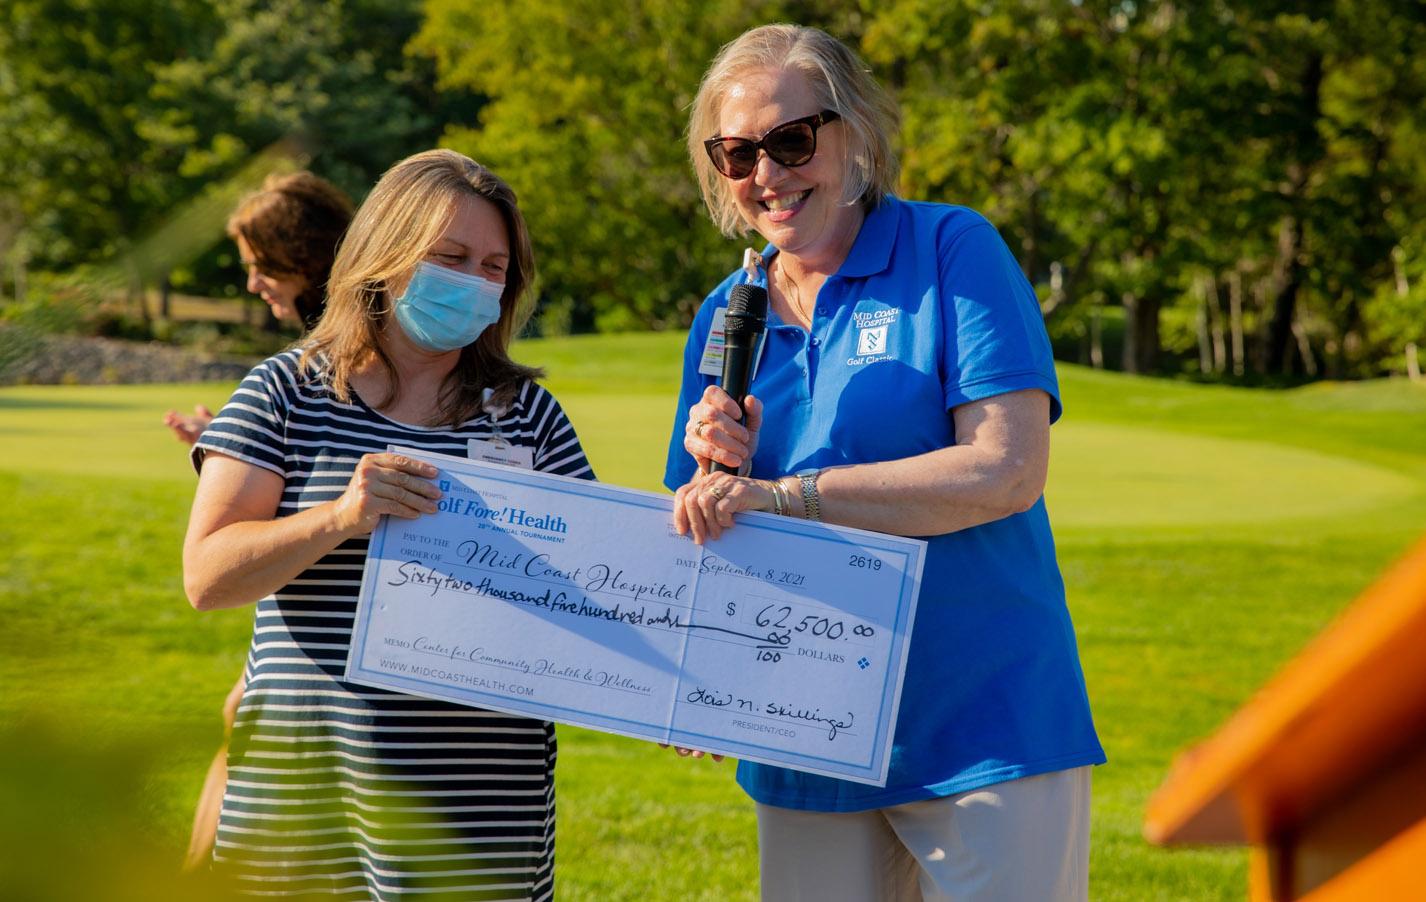 Mid Coast Hospital Golf Fore! Health